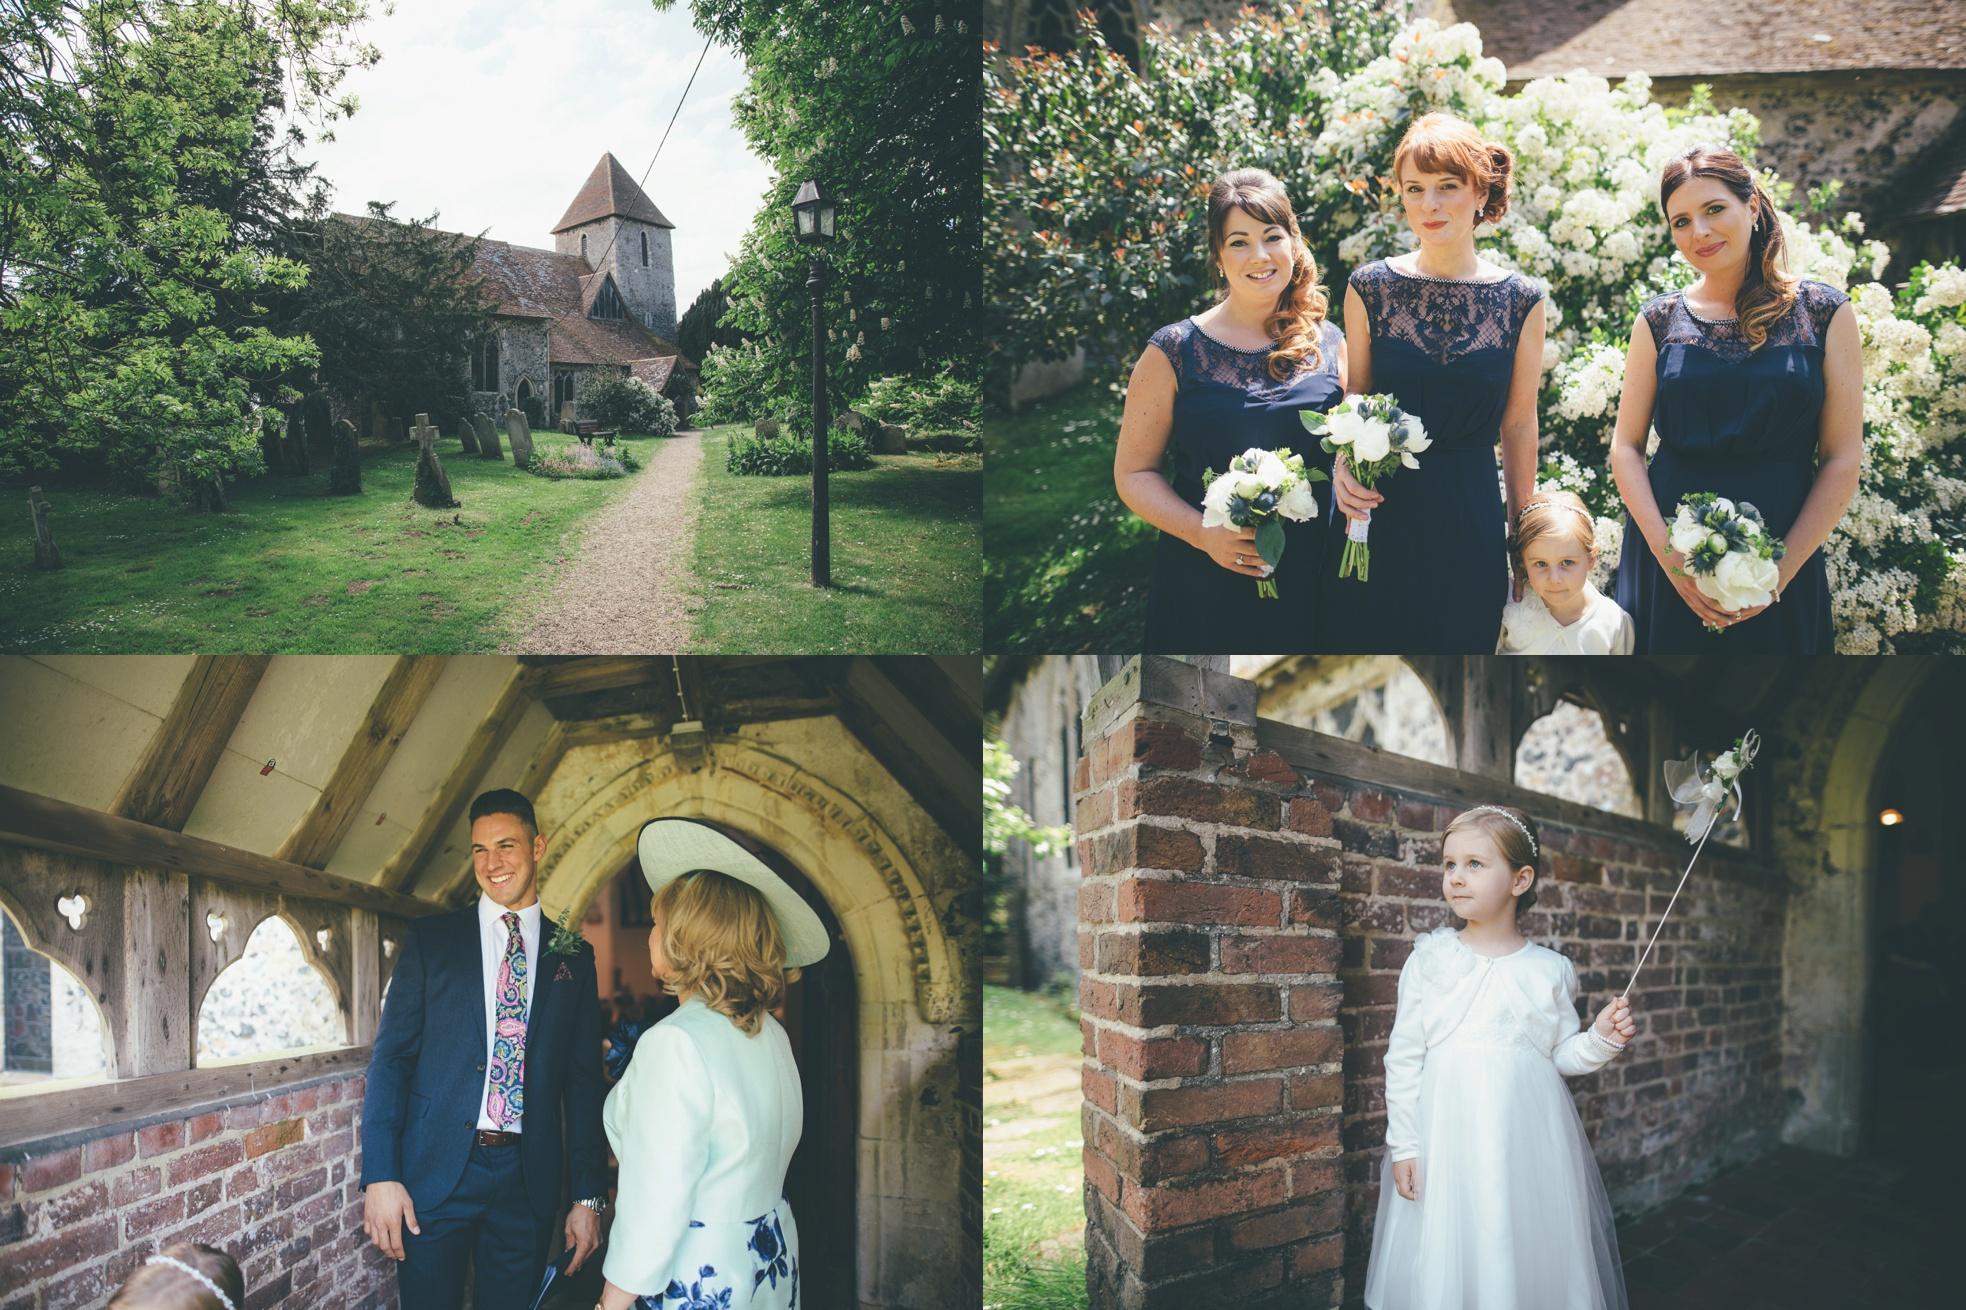 ClaireKieranwedding_PrestonCourtCanterbury_0007.jpg